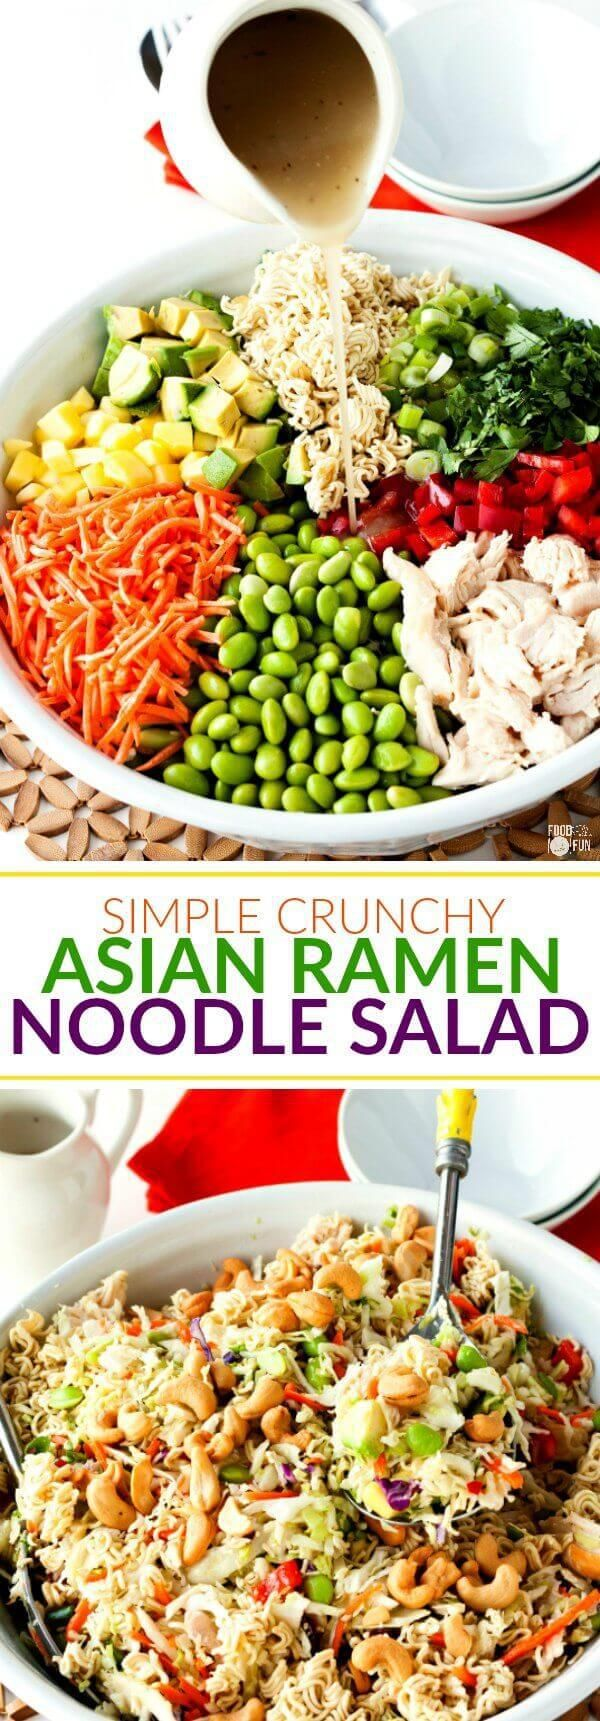 Simple Crunchy Asian Ramen Noodle Salad - The Best Blog Recipe                                                                                                                                                                                 More